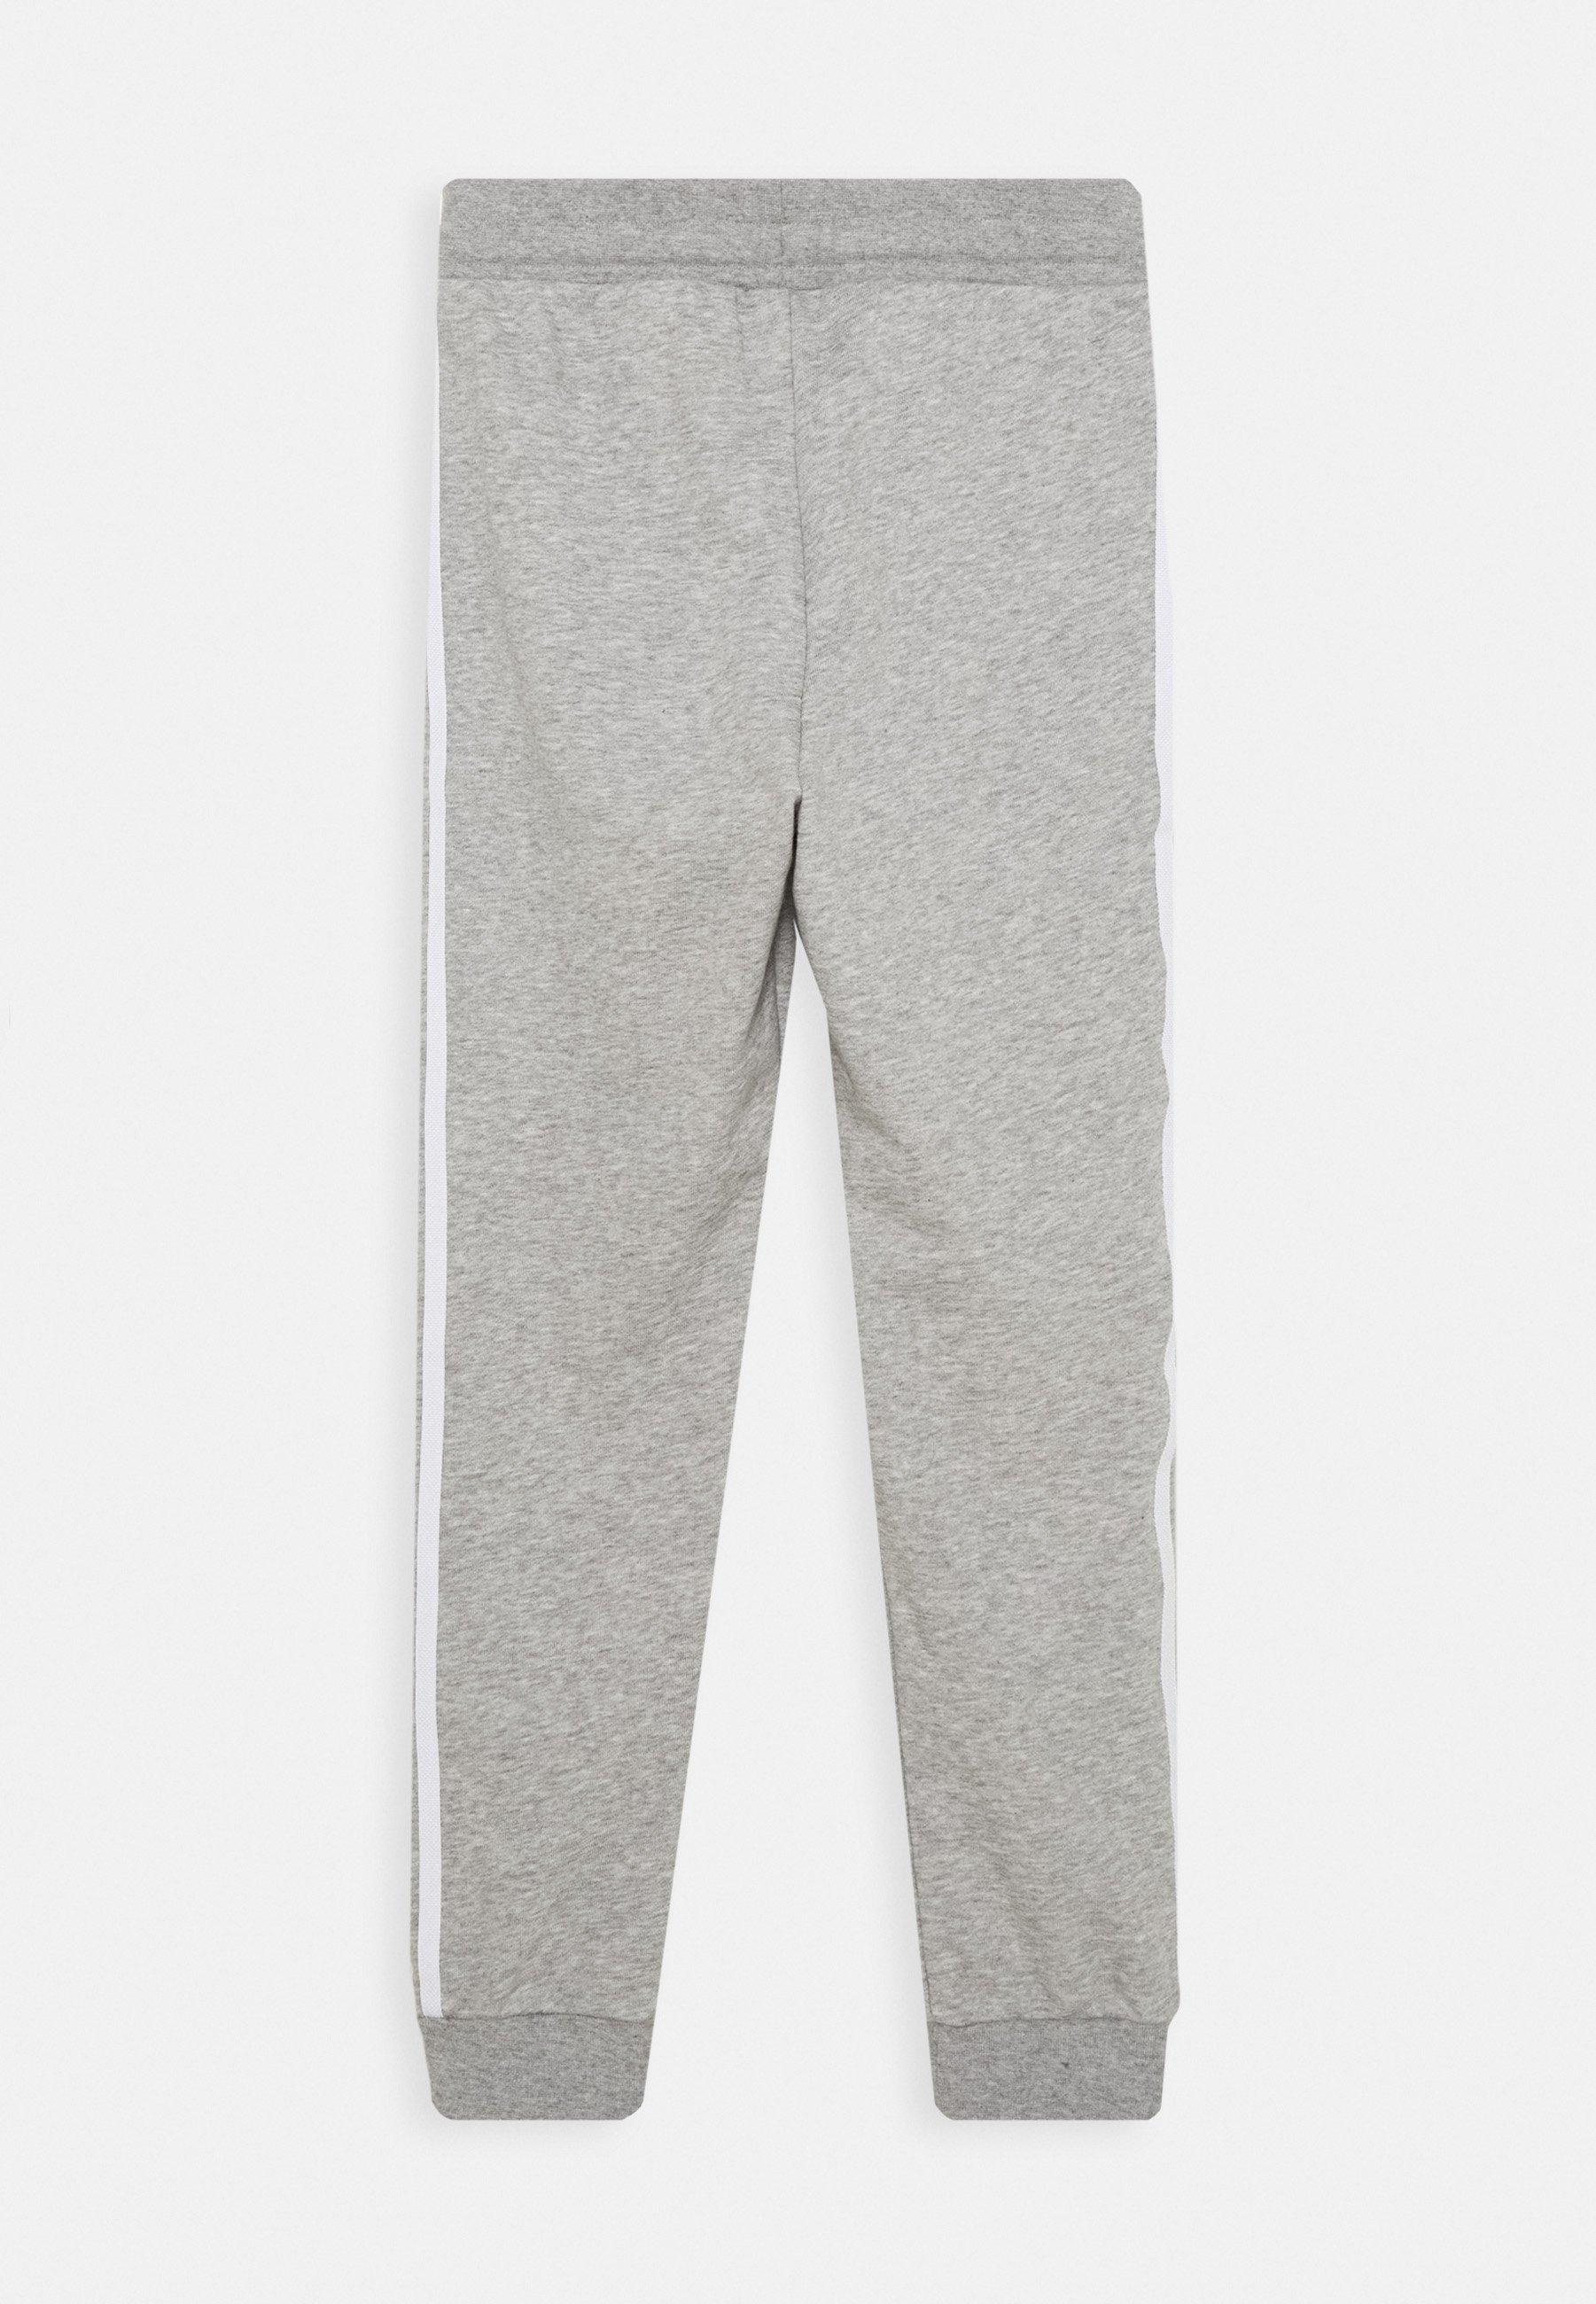 Adidas Originals Trefoil Pants - Joggebukse Grey/white